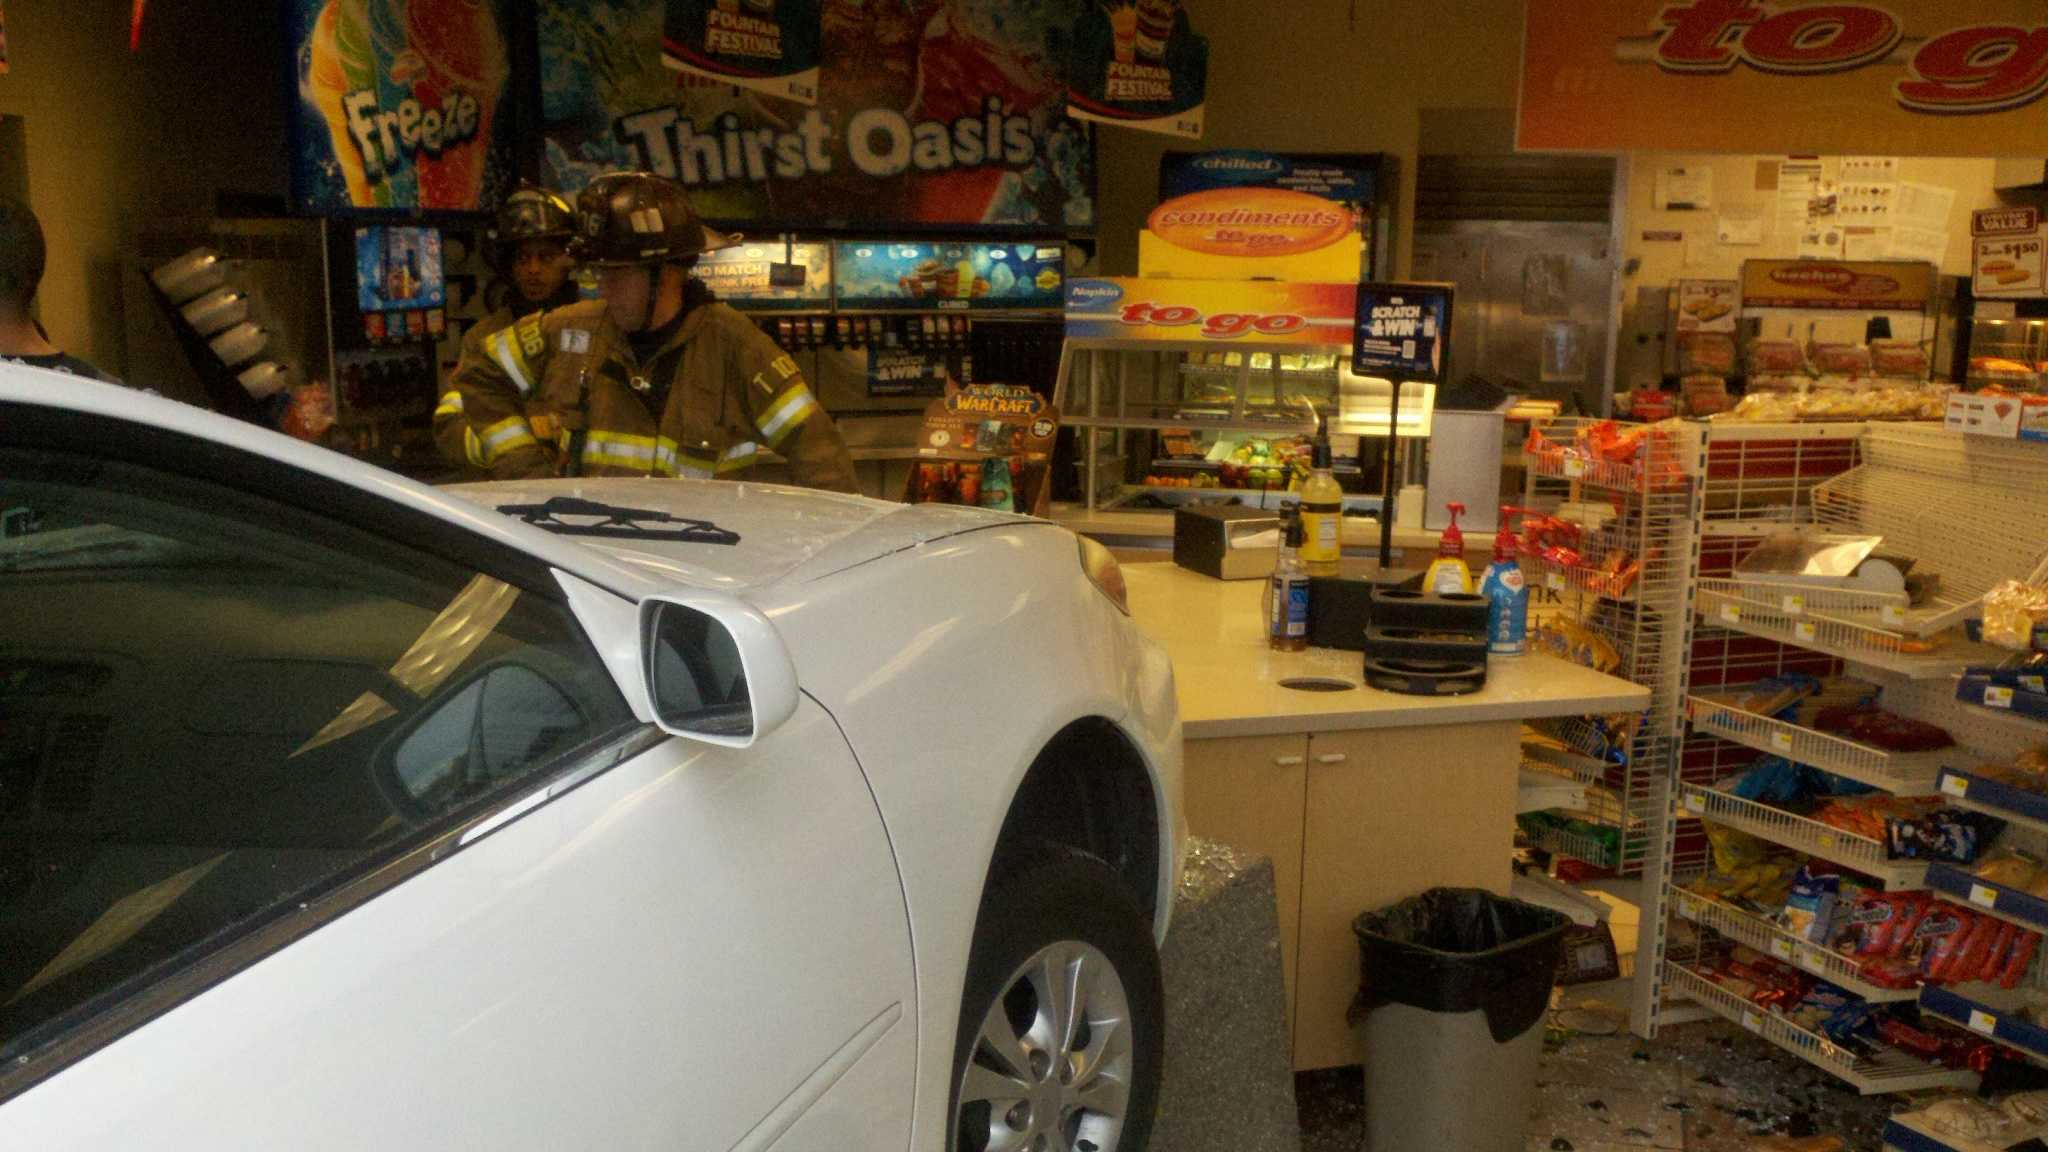 A woman crashed her car into a Sacramento AM/PM gas station on Thursday morning (Nov. 29, 2012).